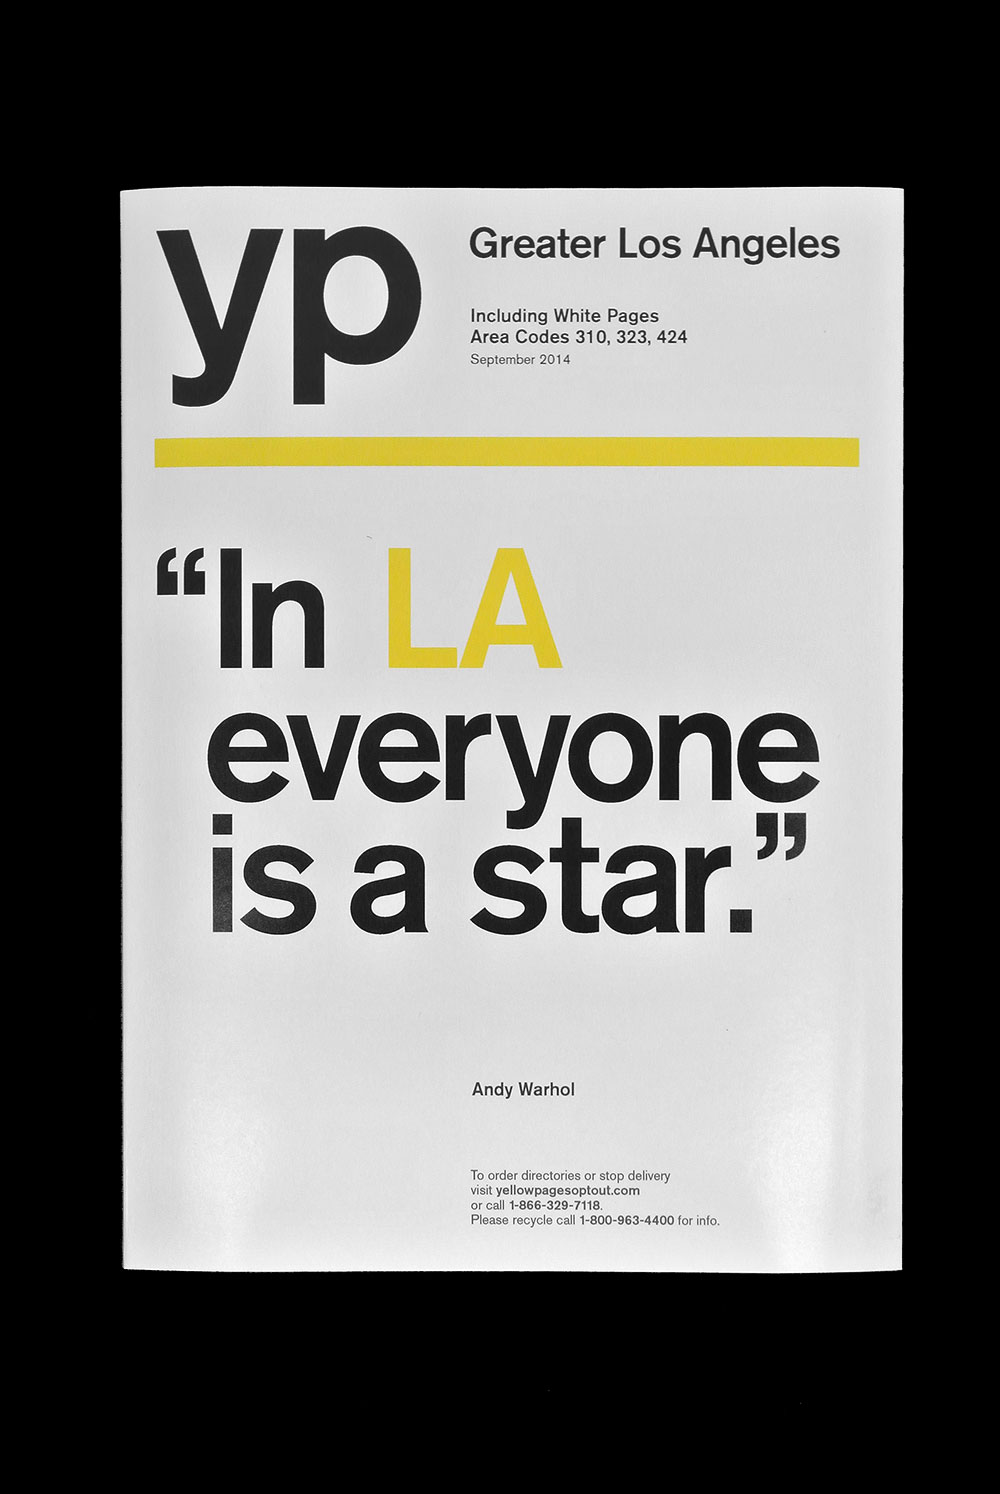 yellow pages YP cover Los Angeles Andy Warhol Matt Matthijs van Leeuwen Interbrand